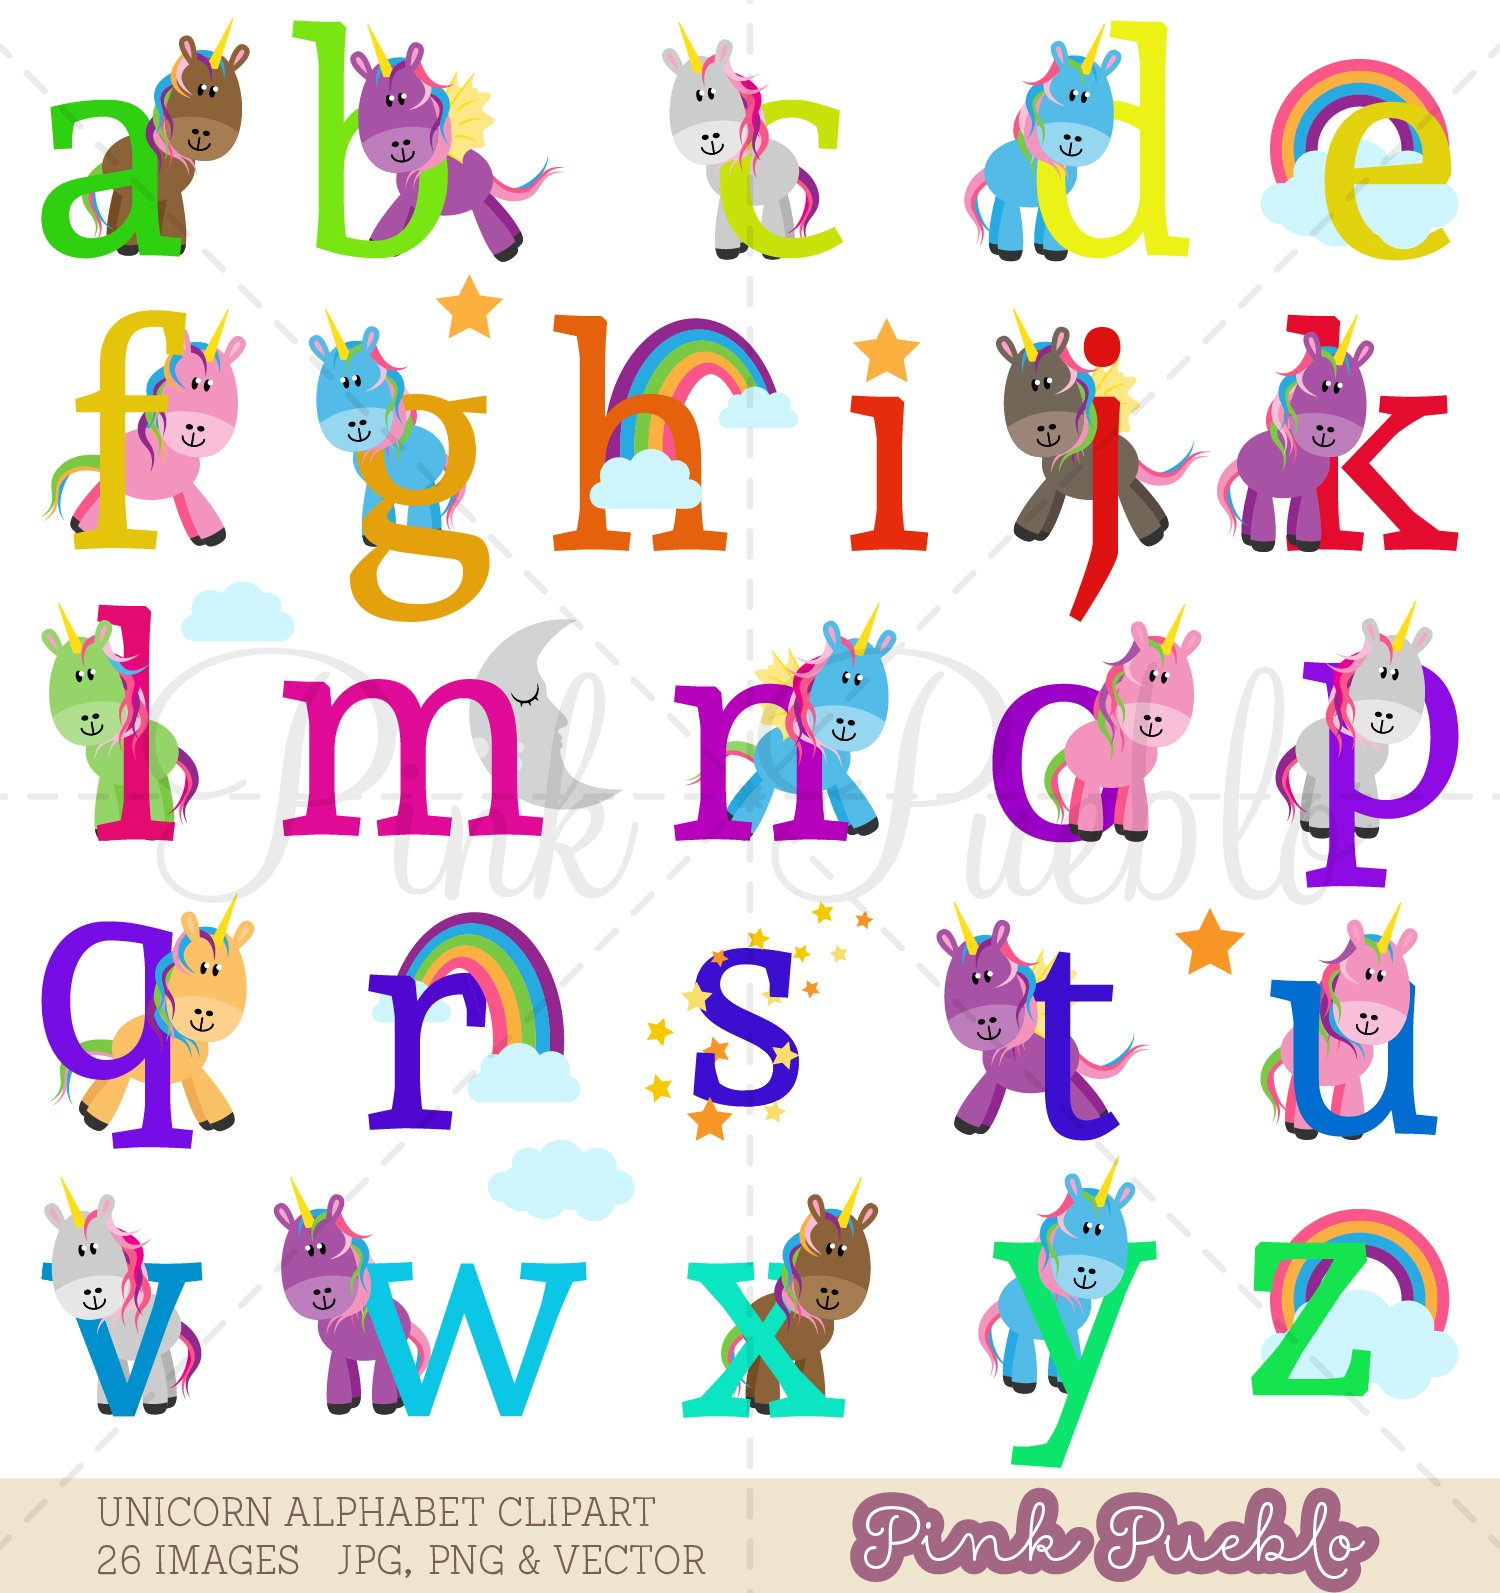 Lowercase Unicorn Alphabet Clipart & Vectors.